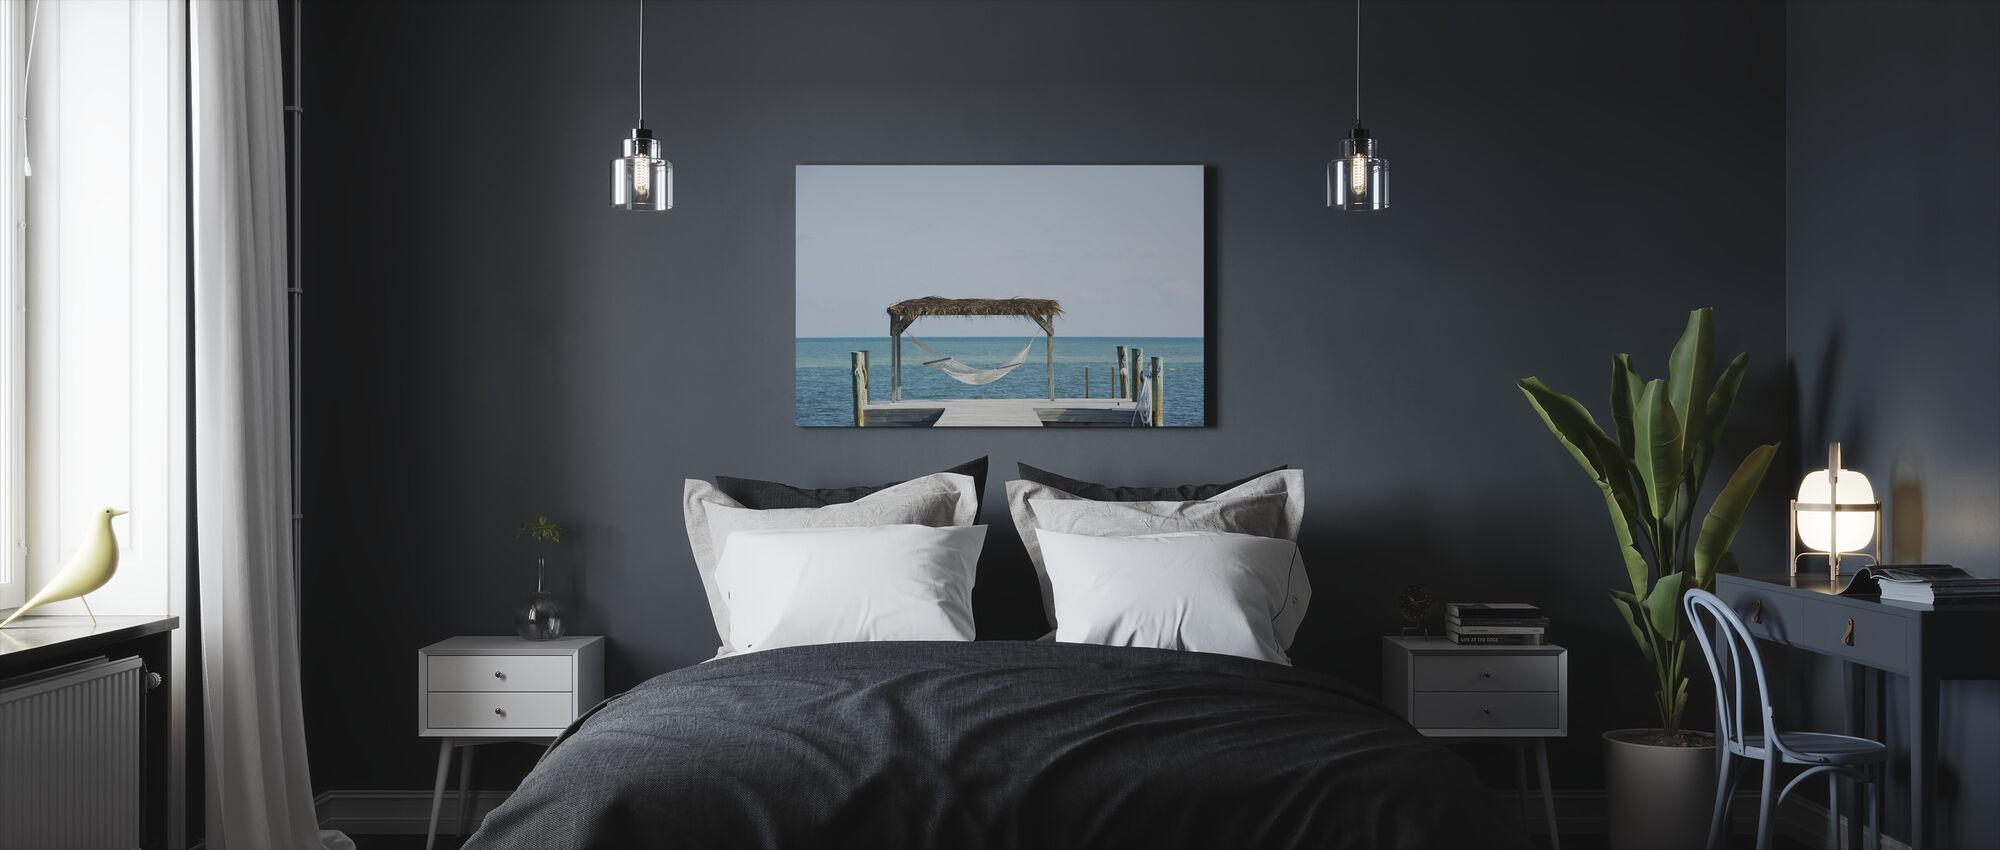 Florida strandpromenad, USA - Canvastavla - Sovrum